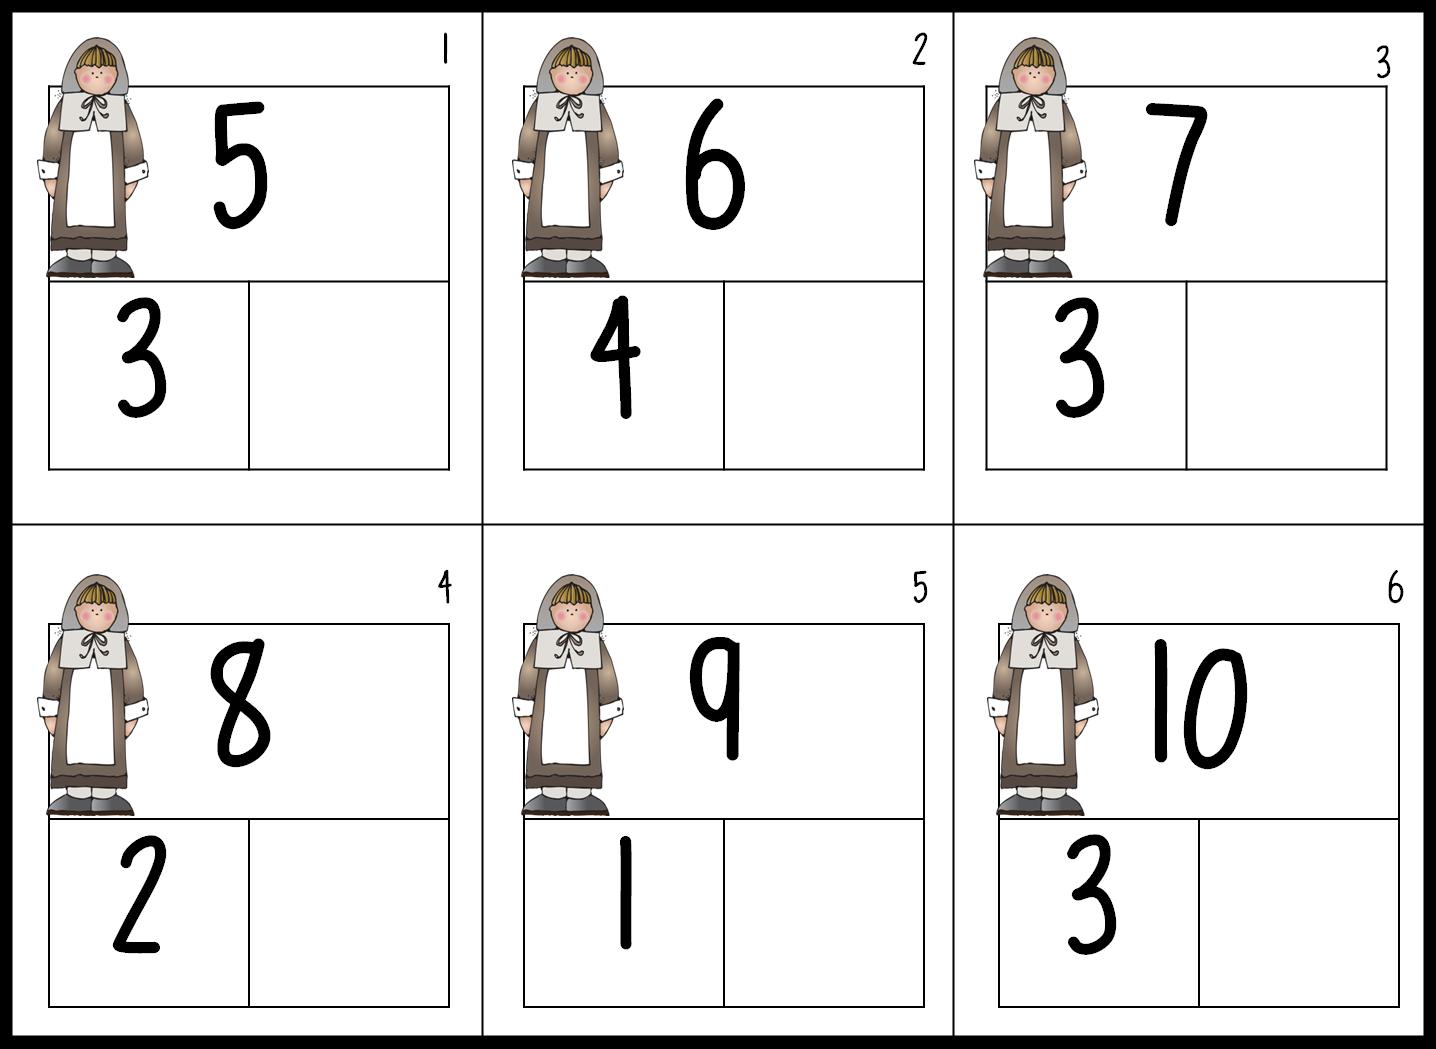 And Decomposing Numbers Worksheet Davezan – Decomposing Numbers Kindergarten Worksheets